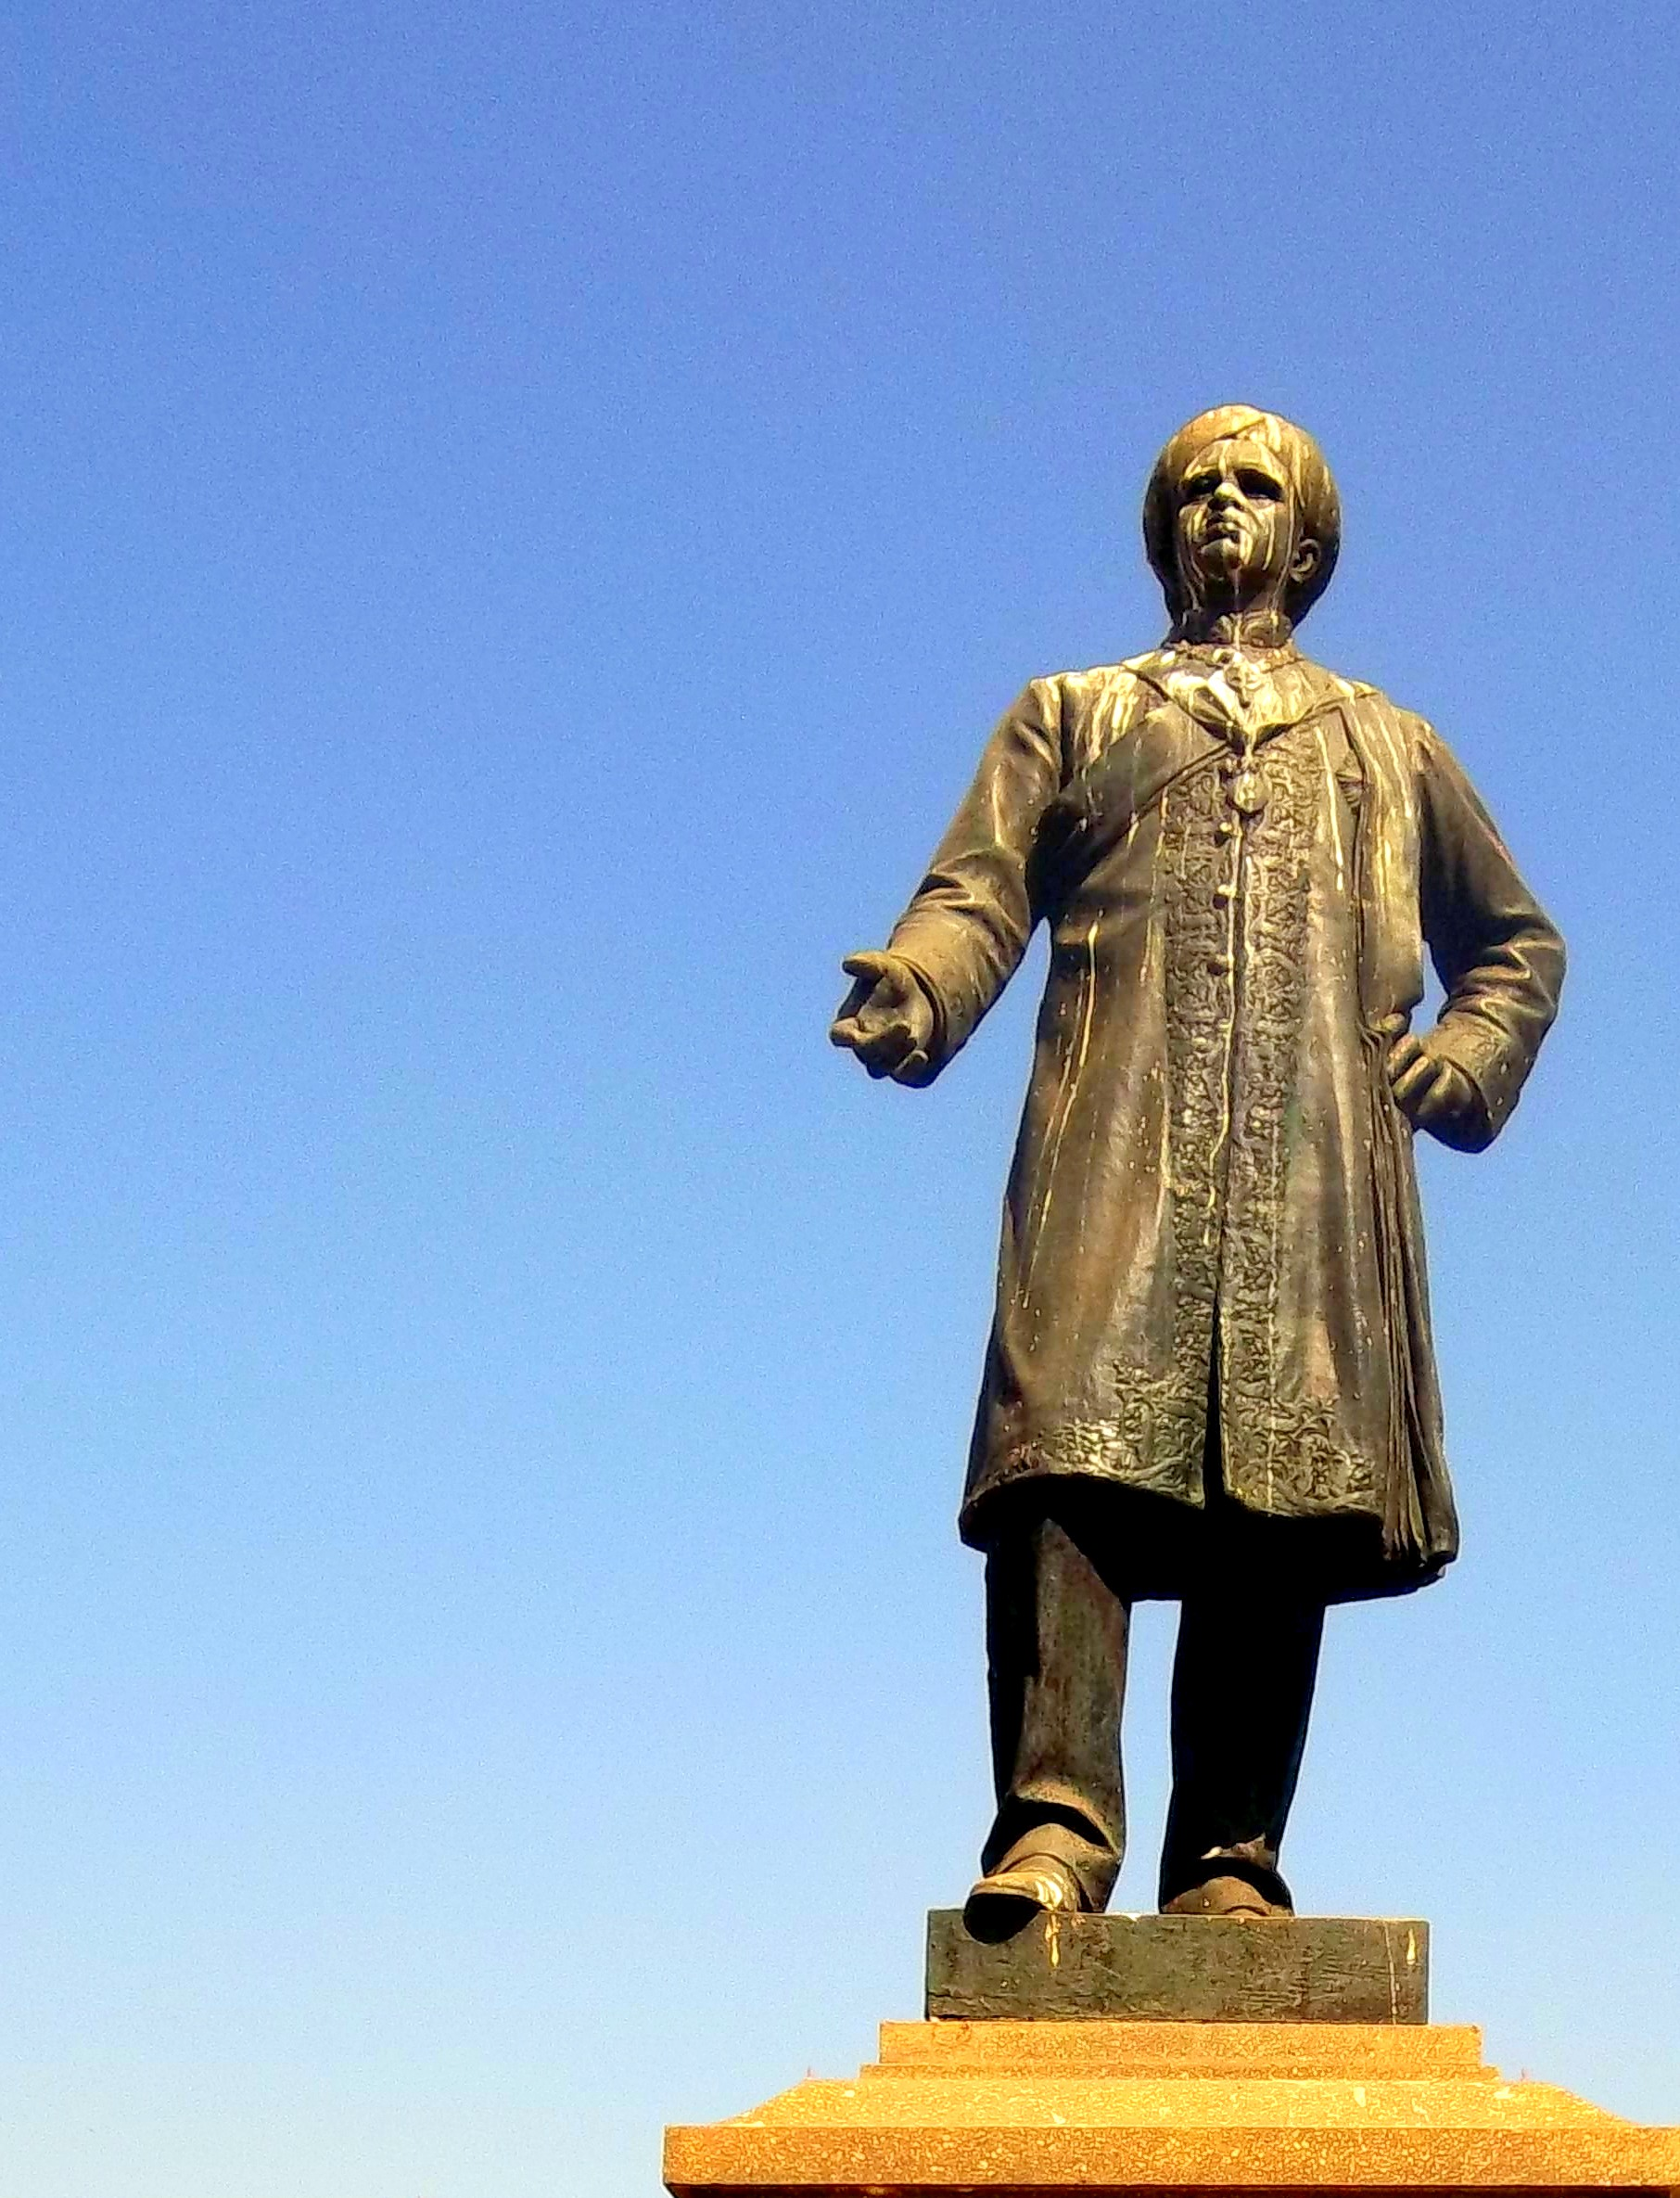 K.Sheshadri Iyer Statue, Cubbon Park